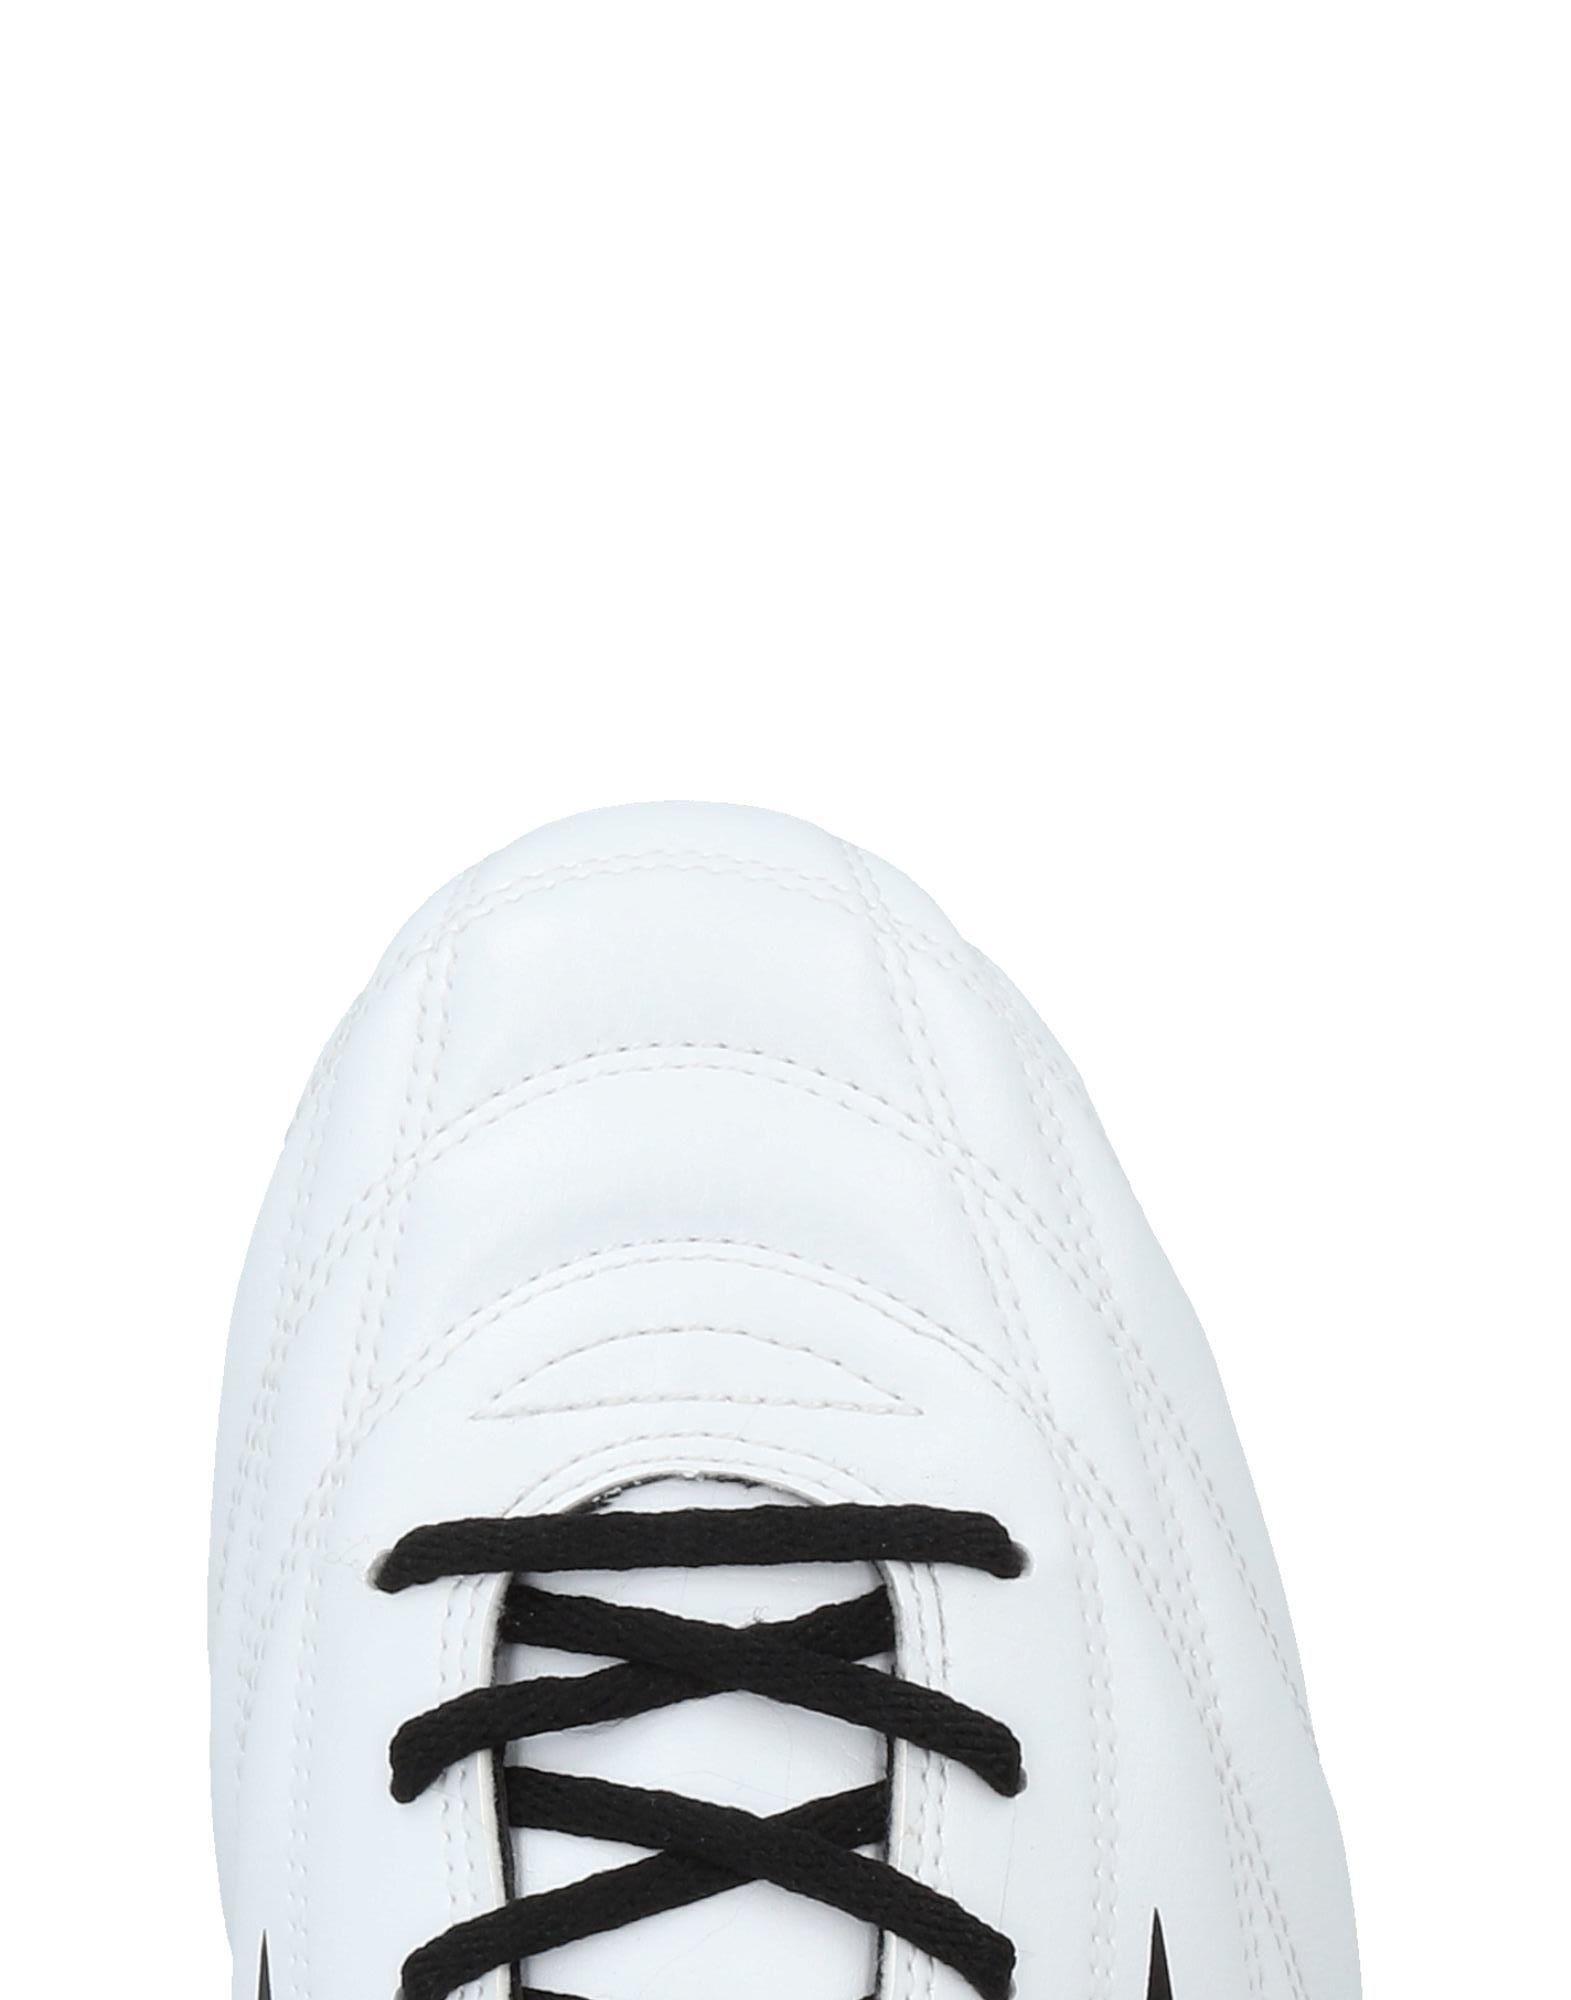 Moda Sneakers Mizuno Mizuno Mizuno Uomo - 11431518RX 07c920